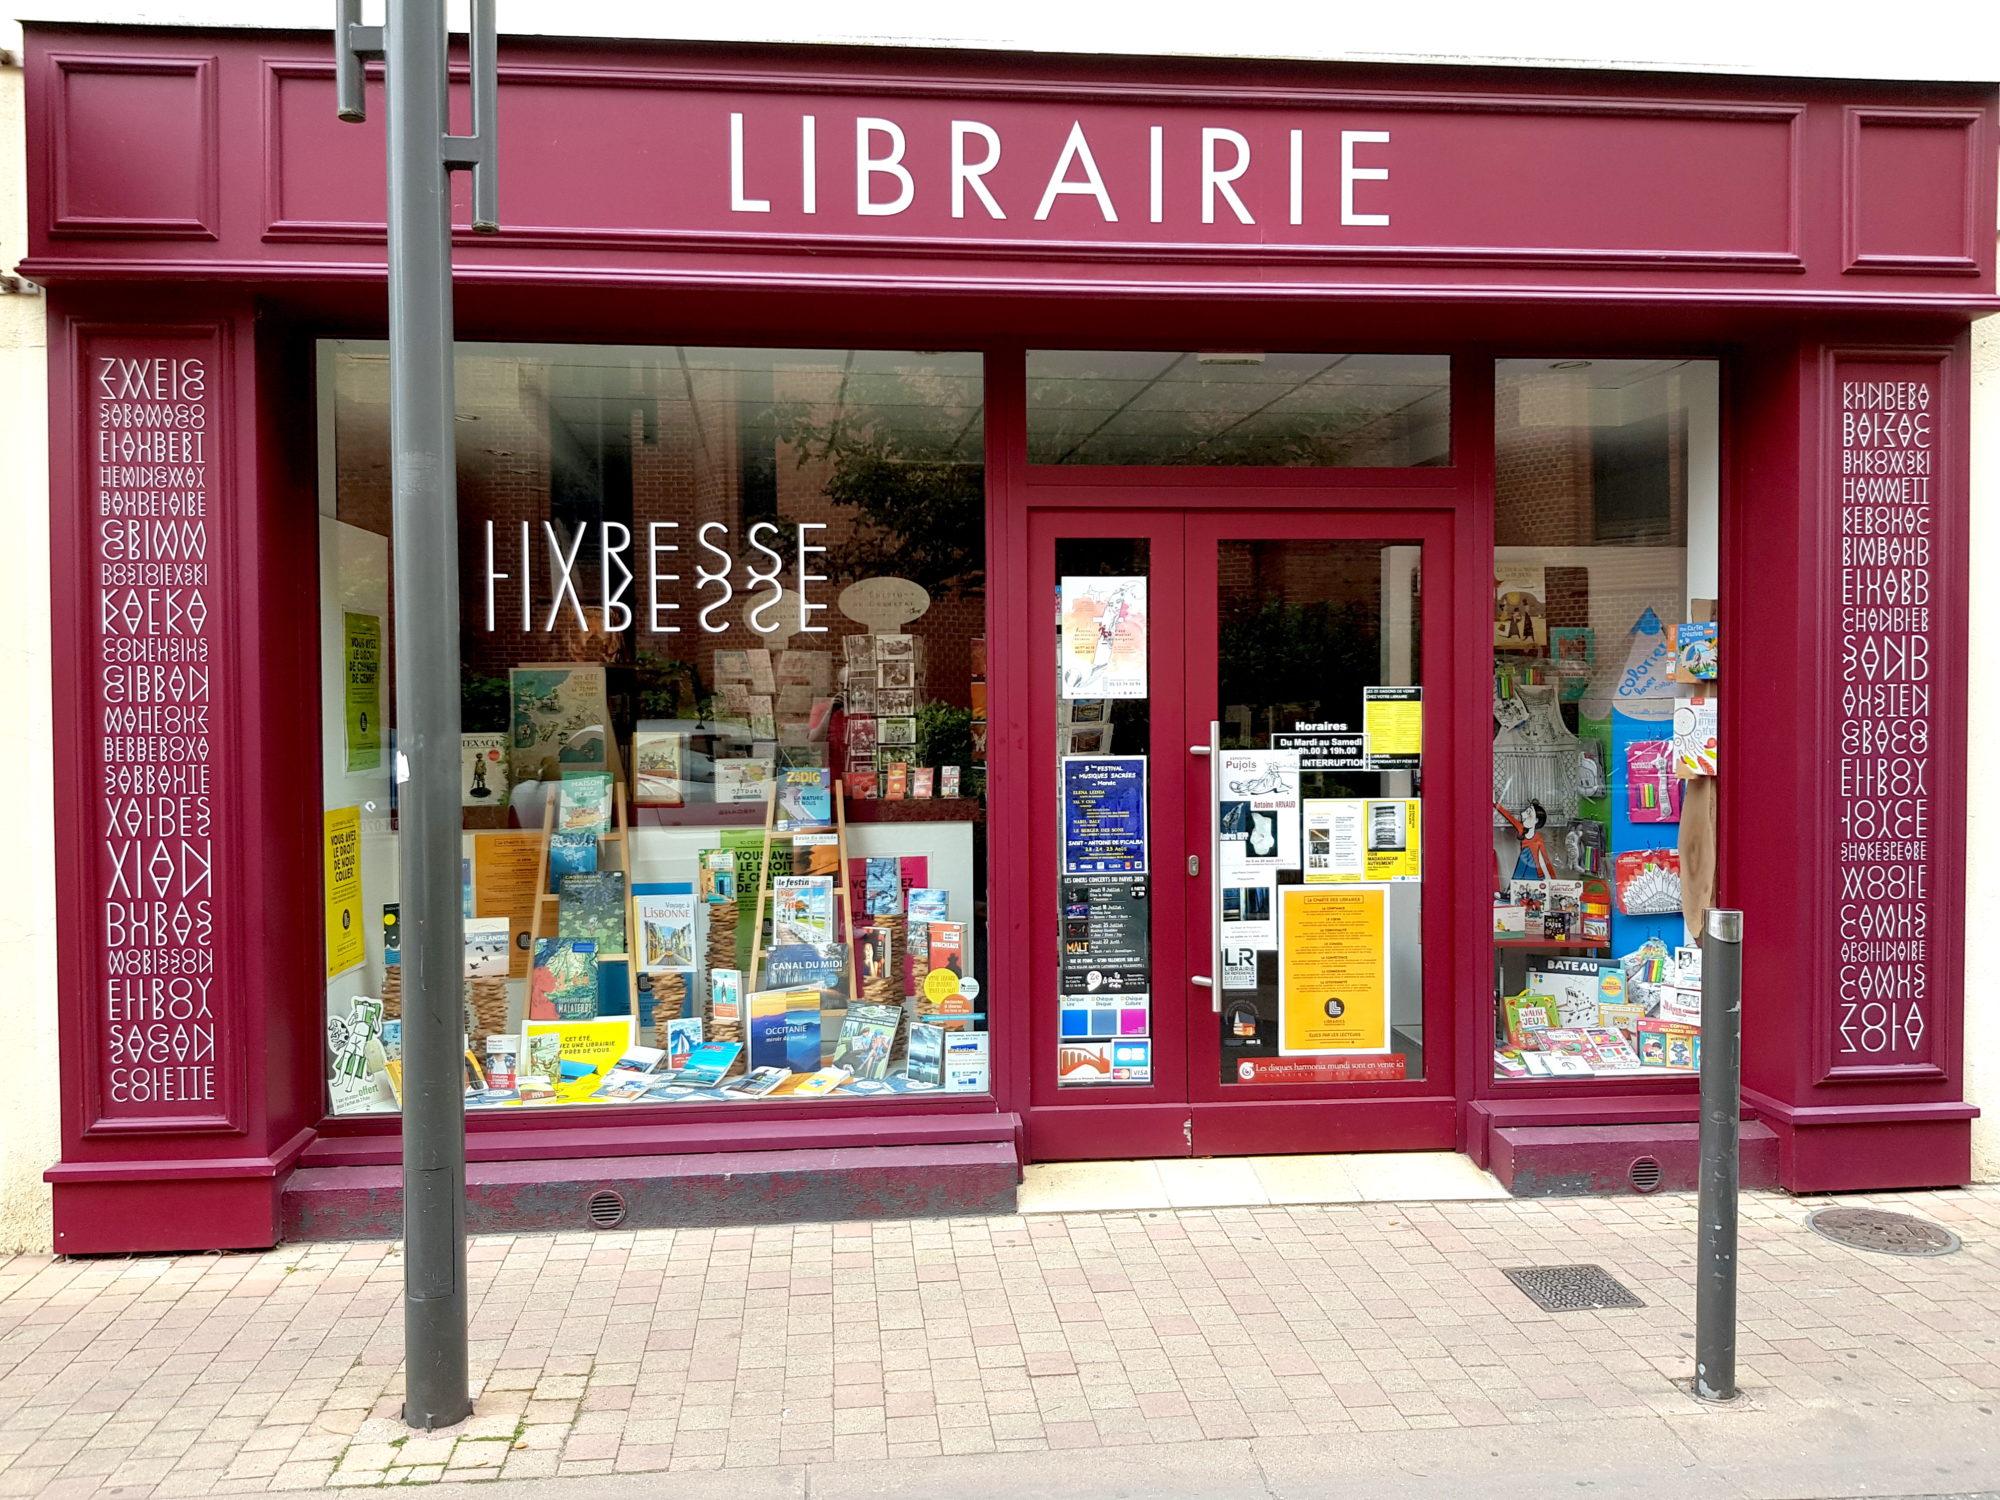 librairie livresse 1